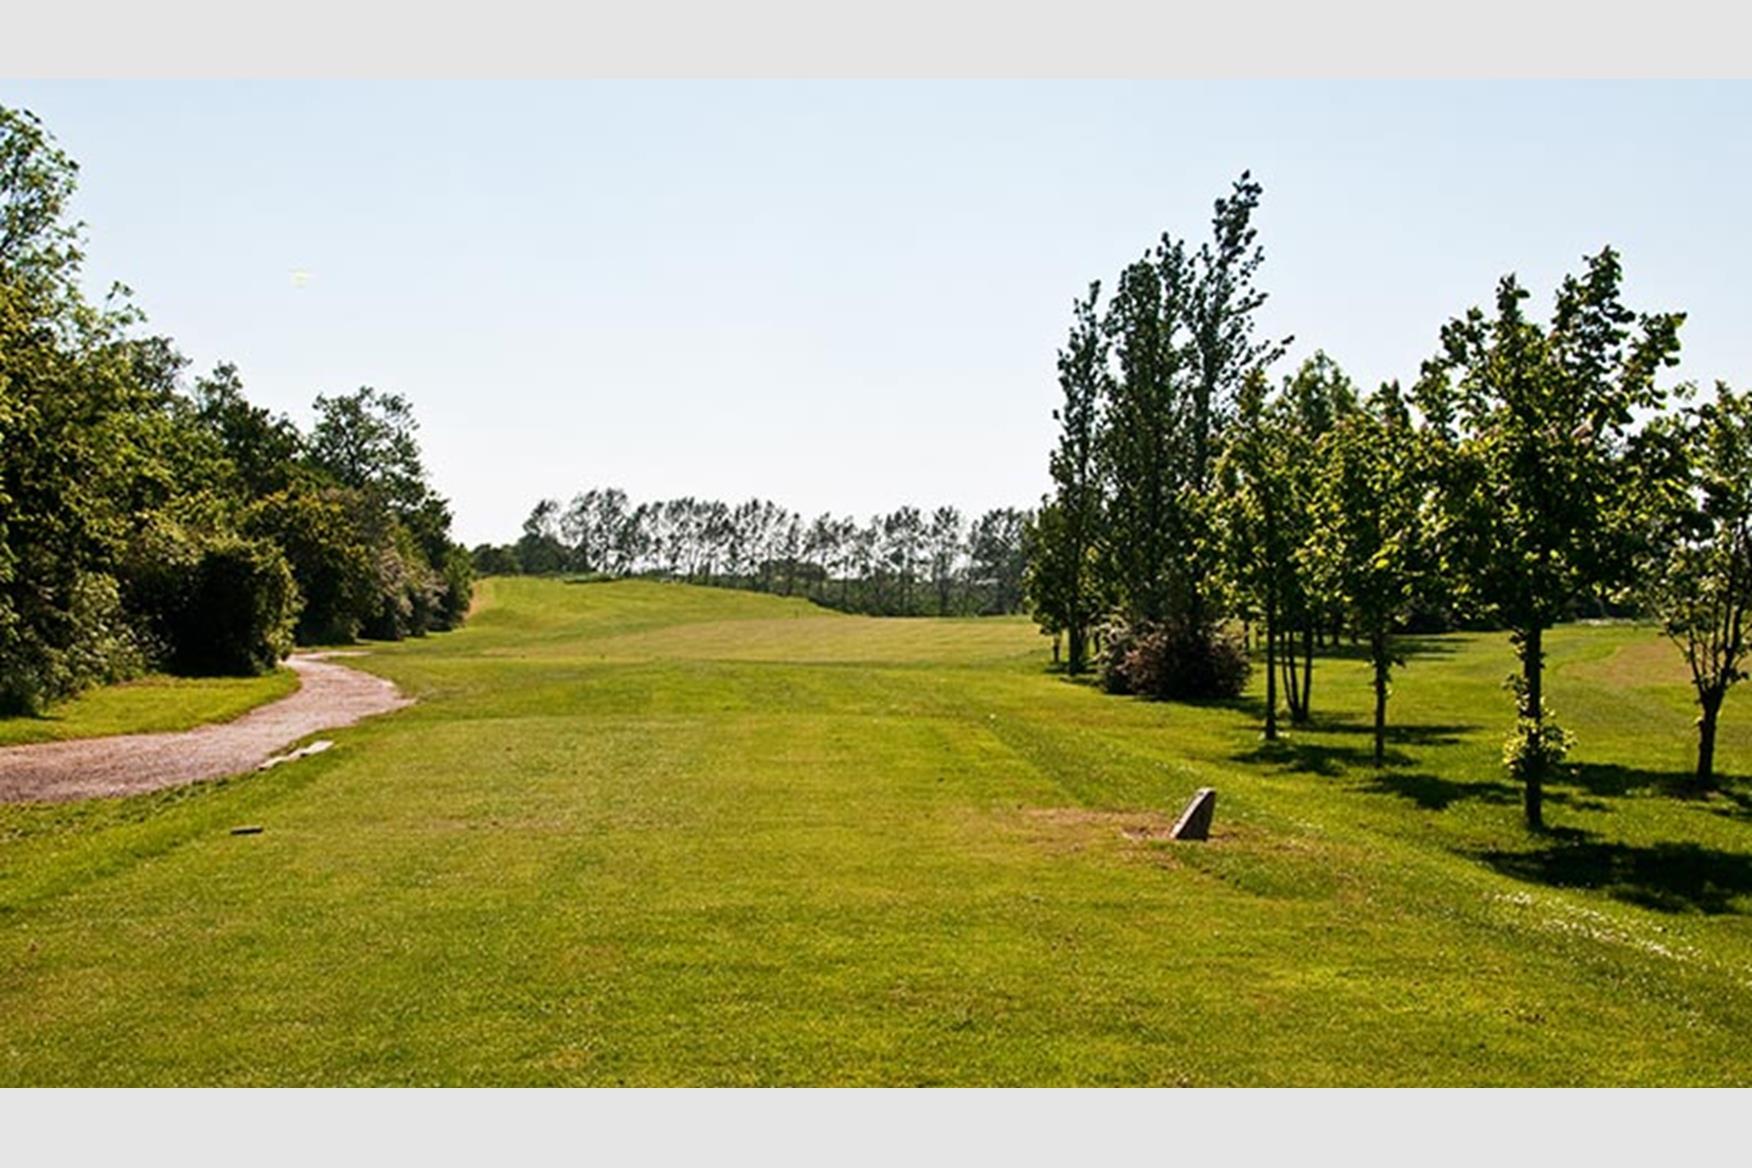 risebridge golf centre golf course in romford golf. Black Bedroom Furniture Sets. Home Design Ideas